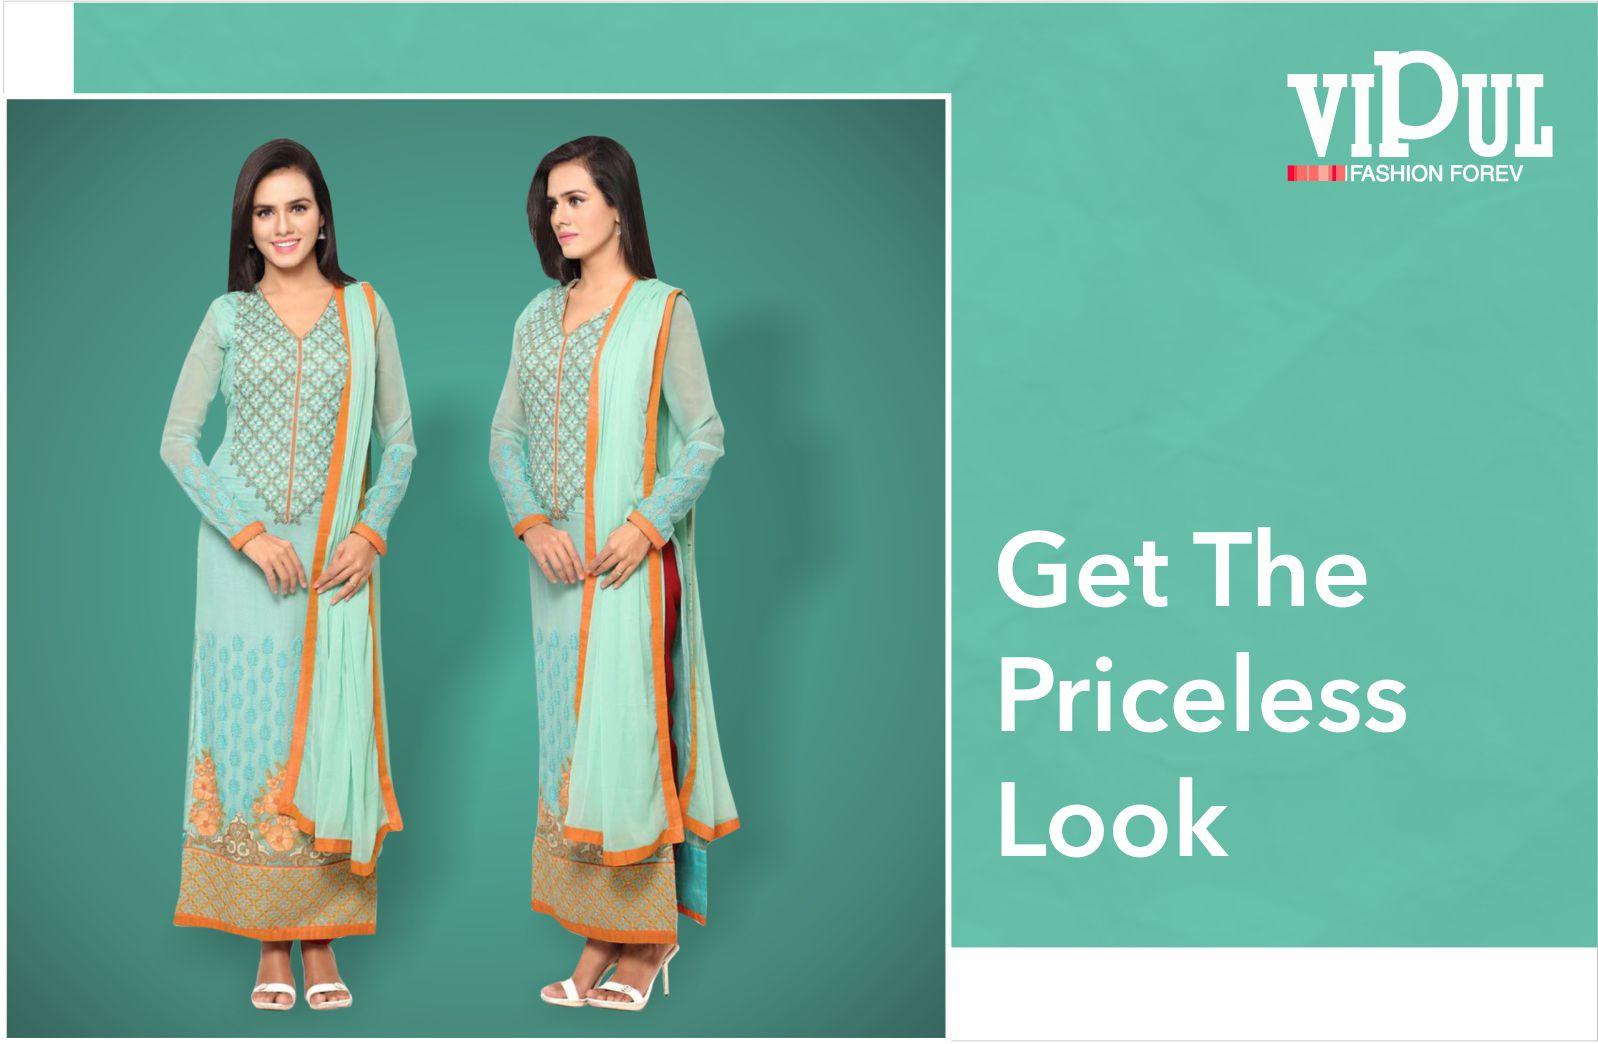 Get the priceless look #VipulFashion #FashionForever #Fashion